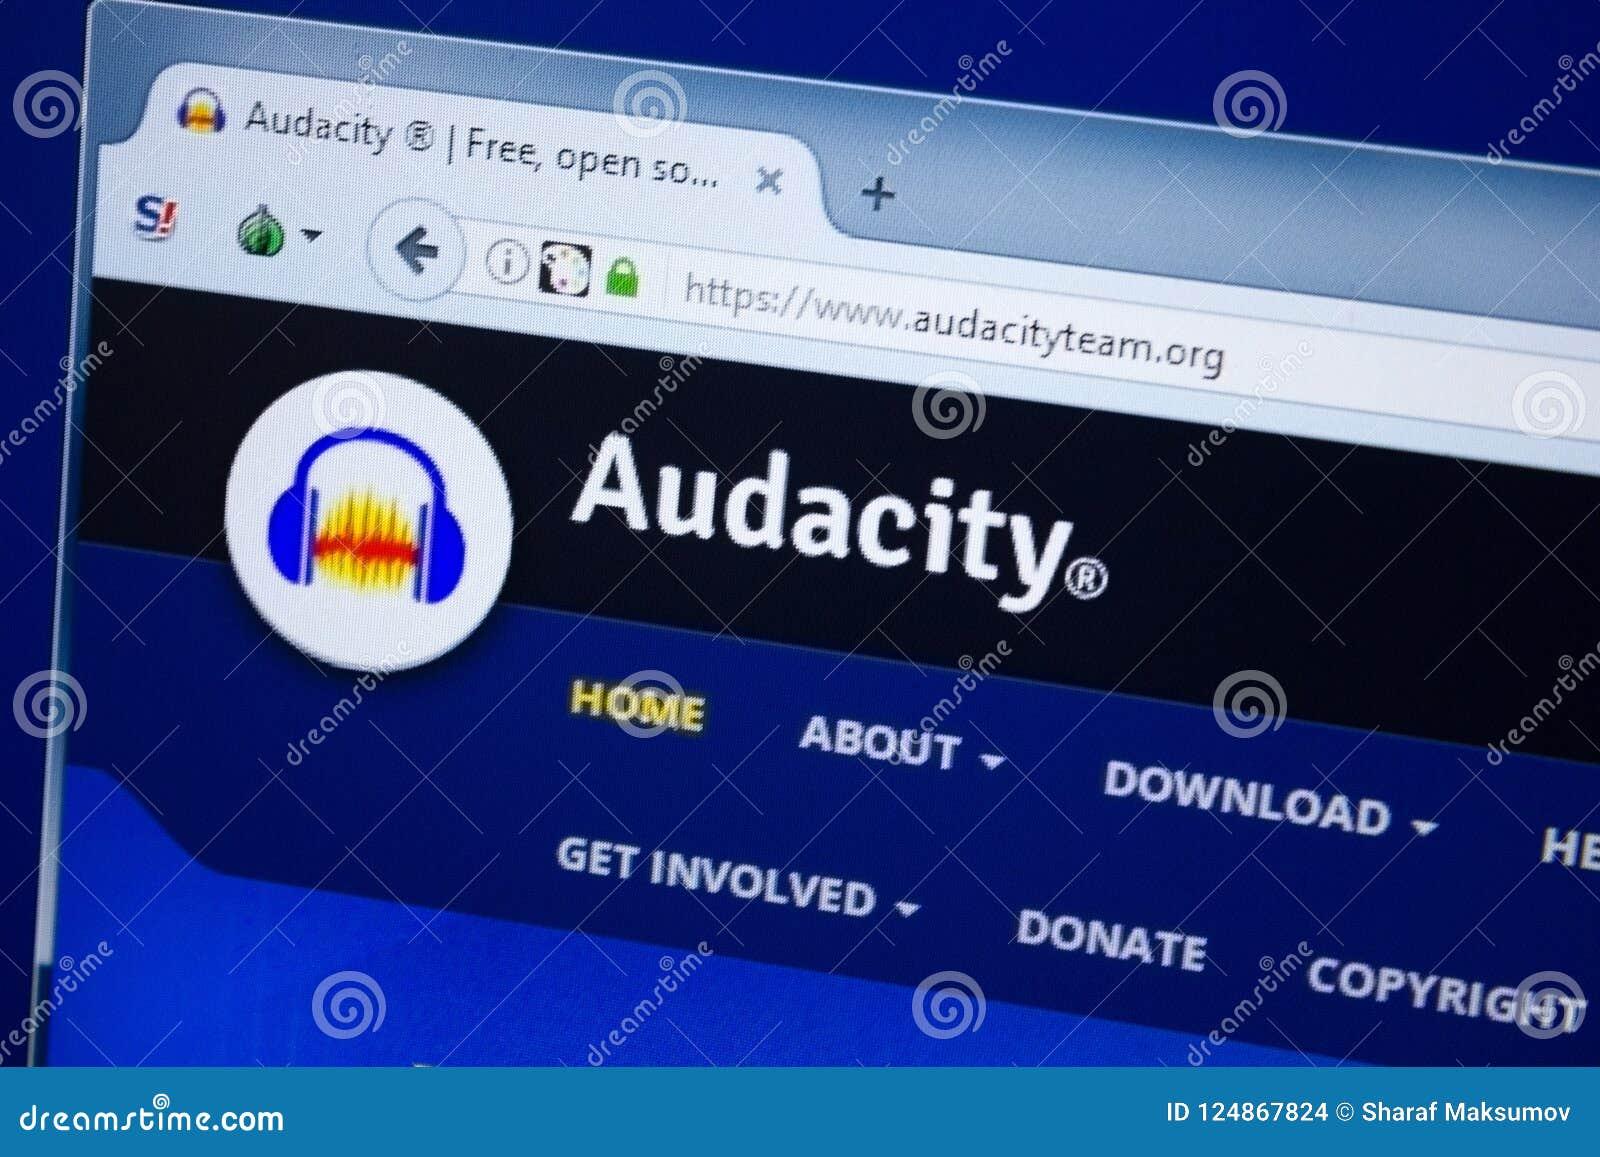 Ryazan, Ρωσία - 26 Αυγούστου 2018: Αρχική σελίδα του ιστοχώρου Audacityteam στην επίδειξη του PC Url - Audacityteam org